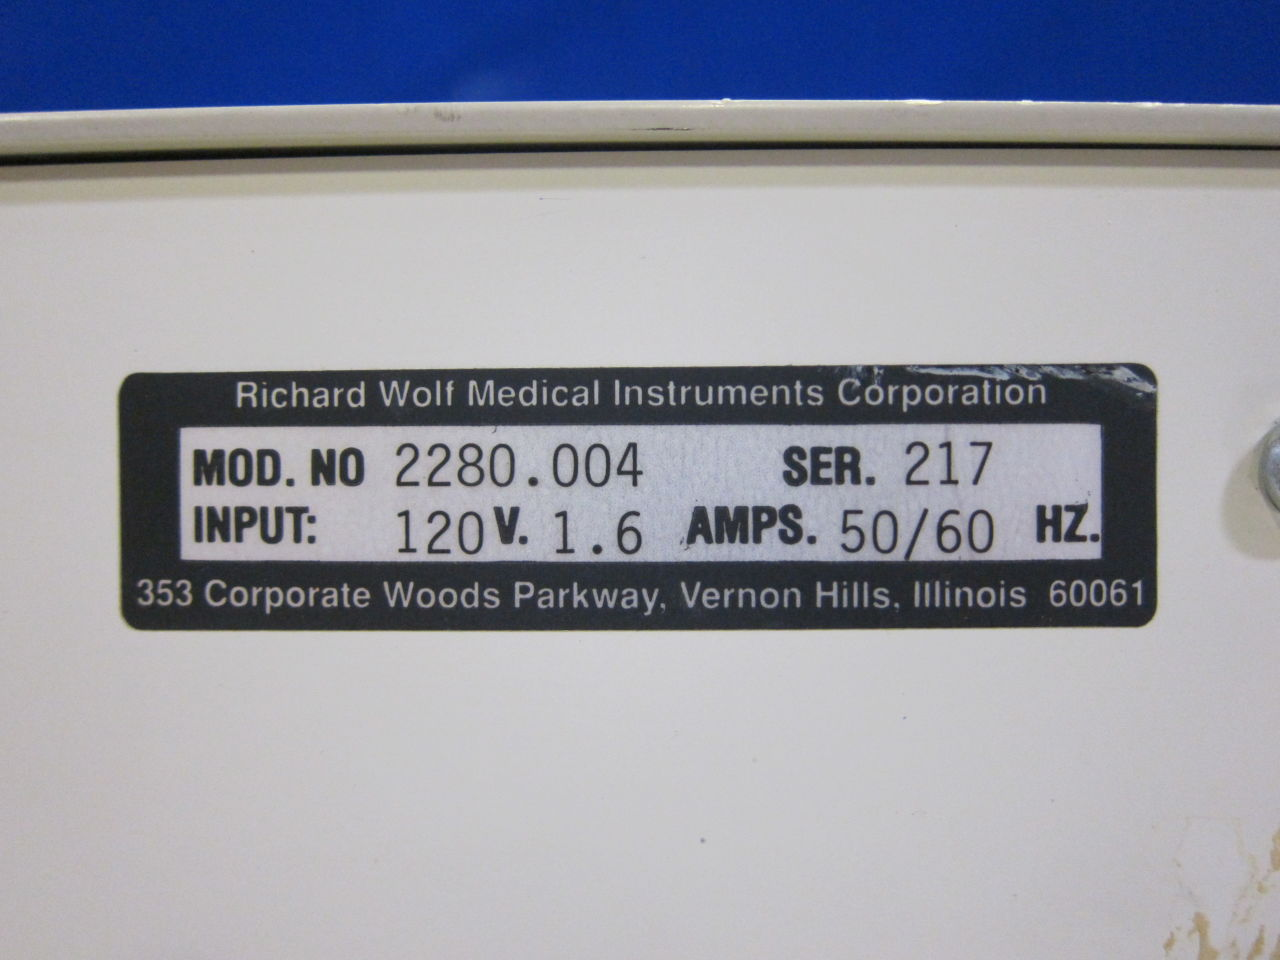 RICHARD WOLF Riwolith 228.004 Lithotripter